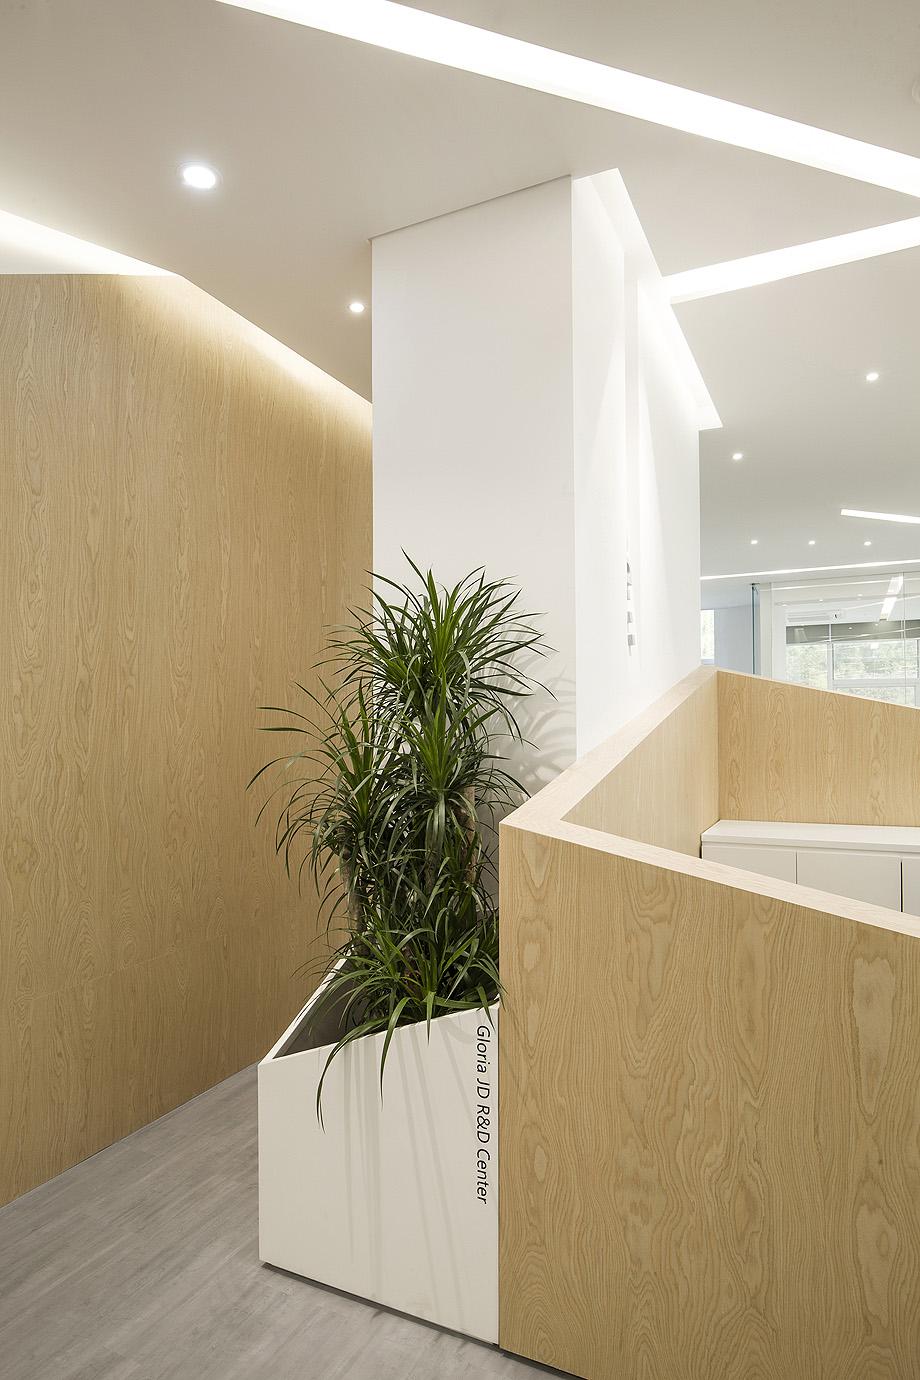 oficinas empresa farmaceutica por feeling design - foto wu wen (13)